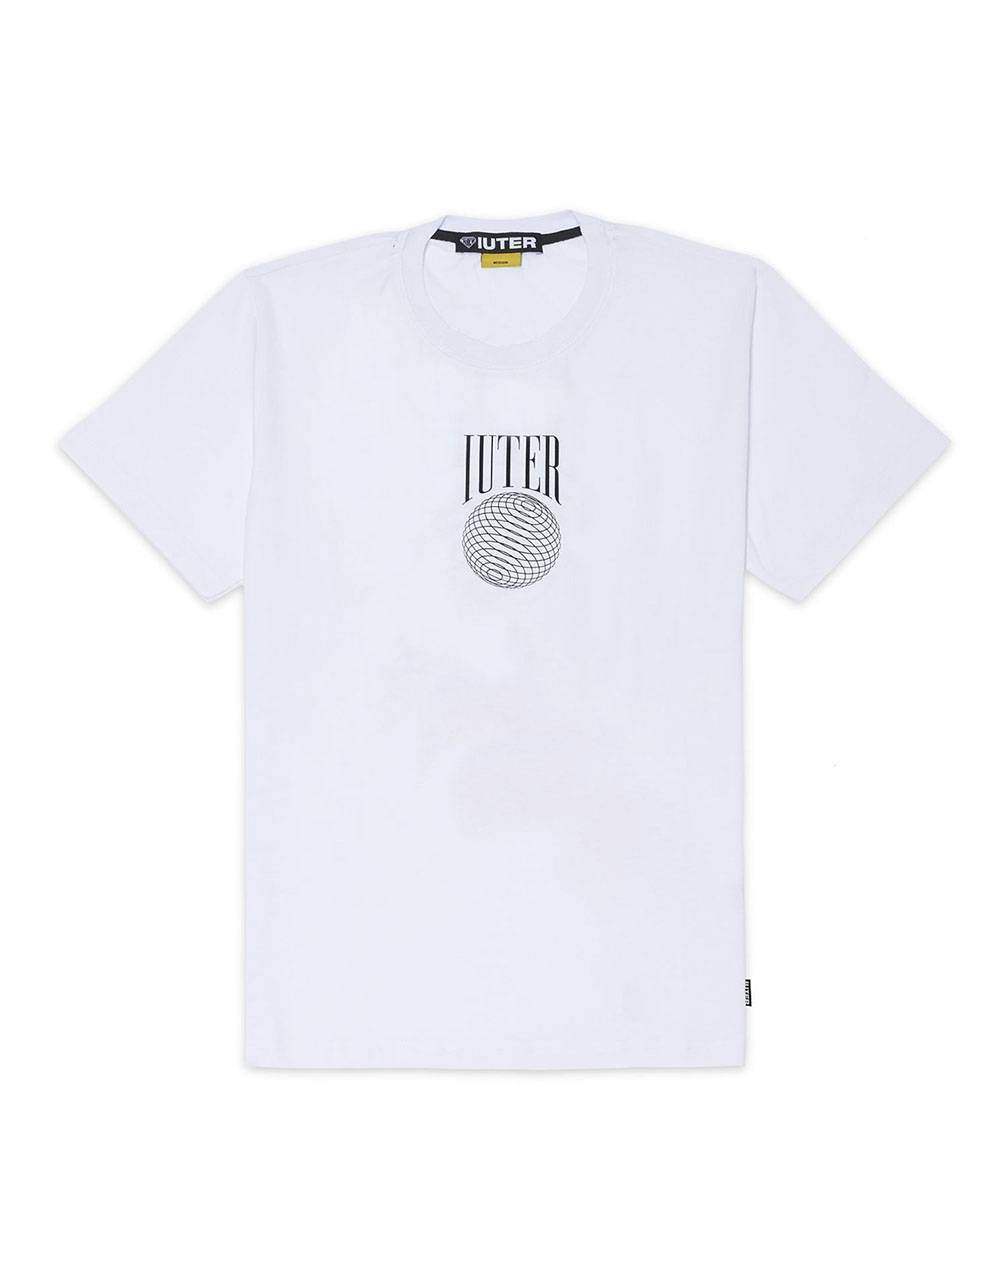 Iuter Landlord tee - white IUTER T-shirt 36,89€